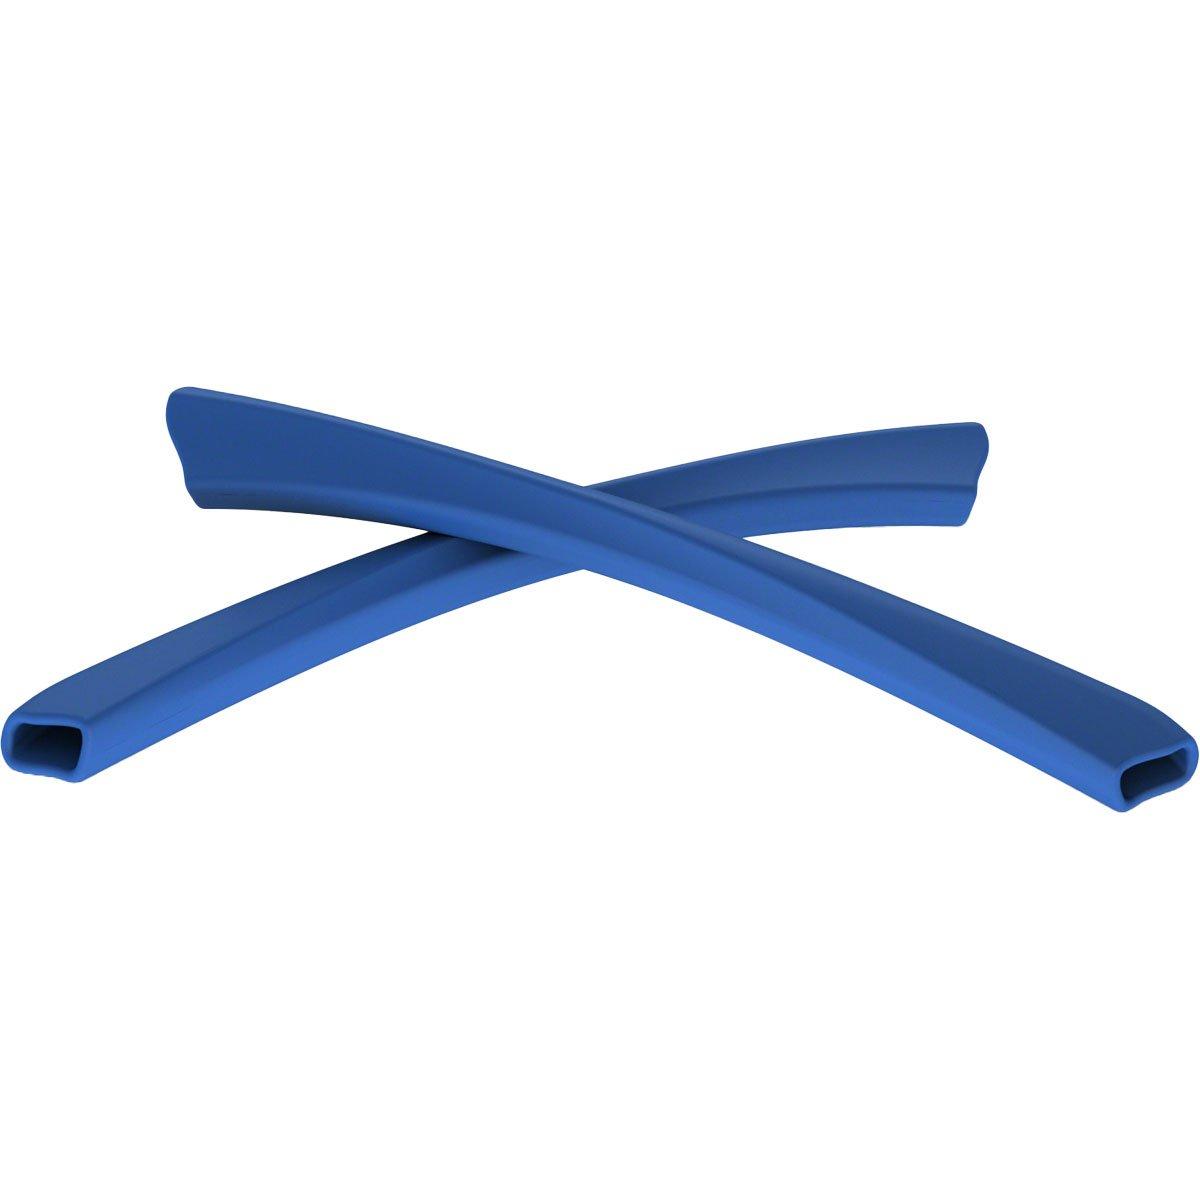 Oakley OO9200 Quarter Jacket Sock Kit Sunglass Accessories - Electric Blue/One Size